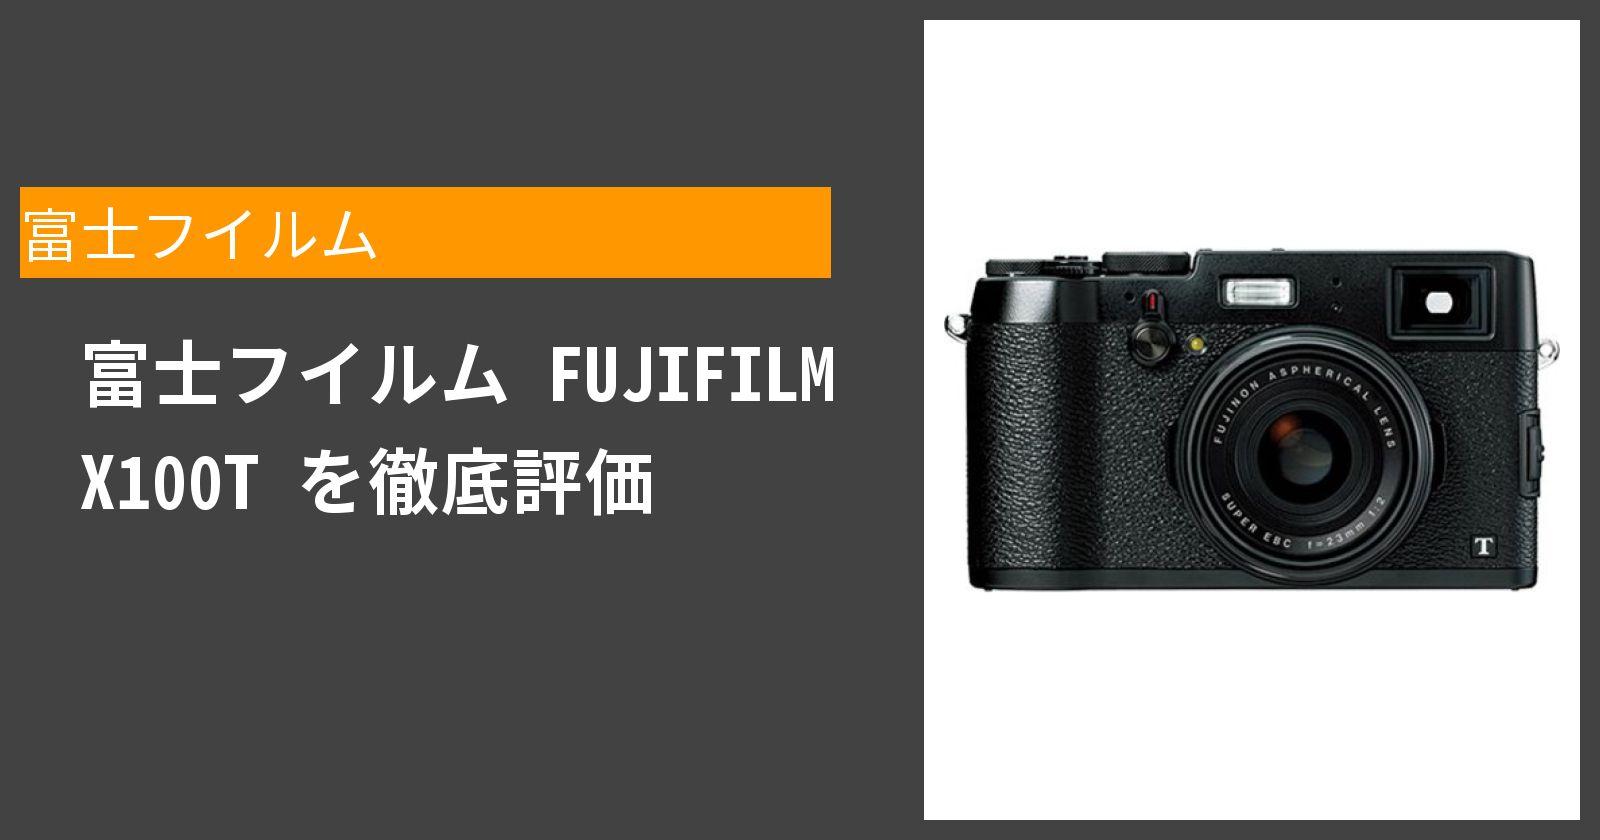 FUJIFILM X100Tを徹底評価